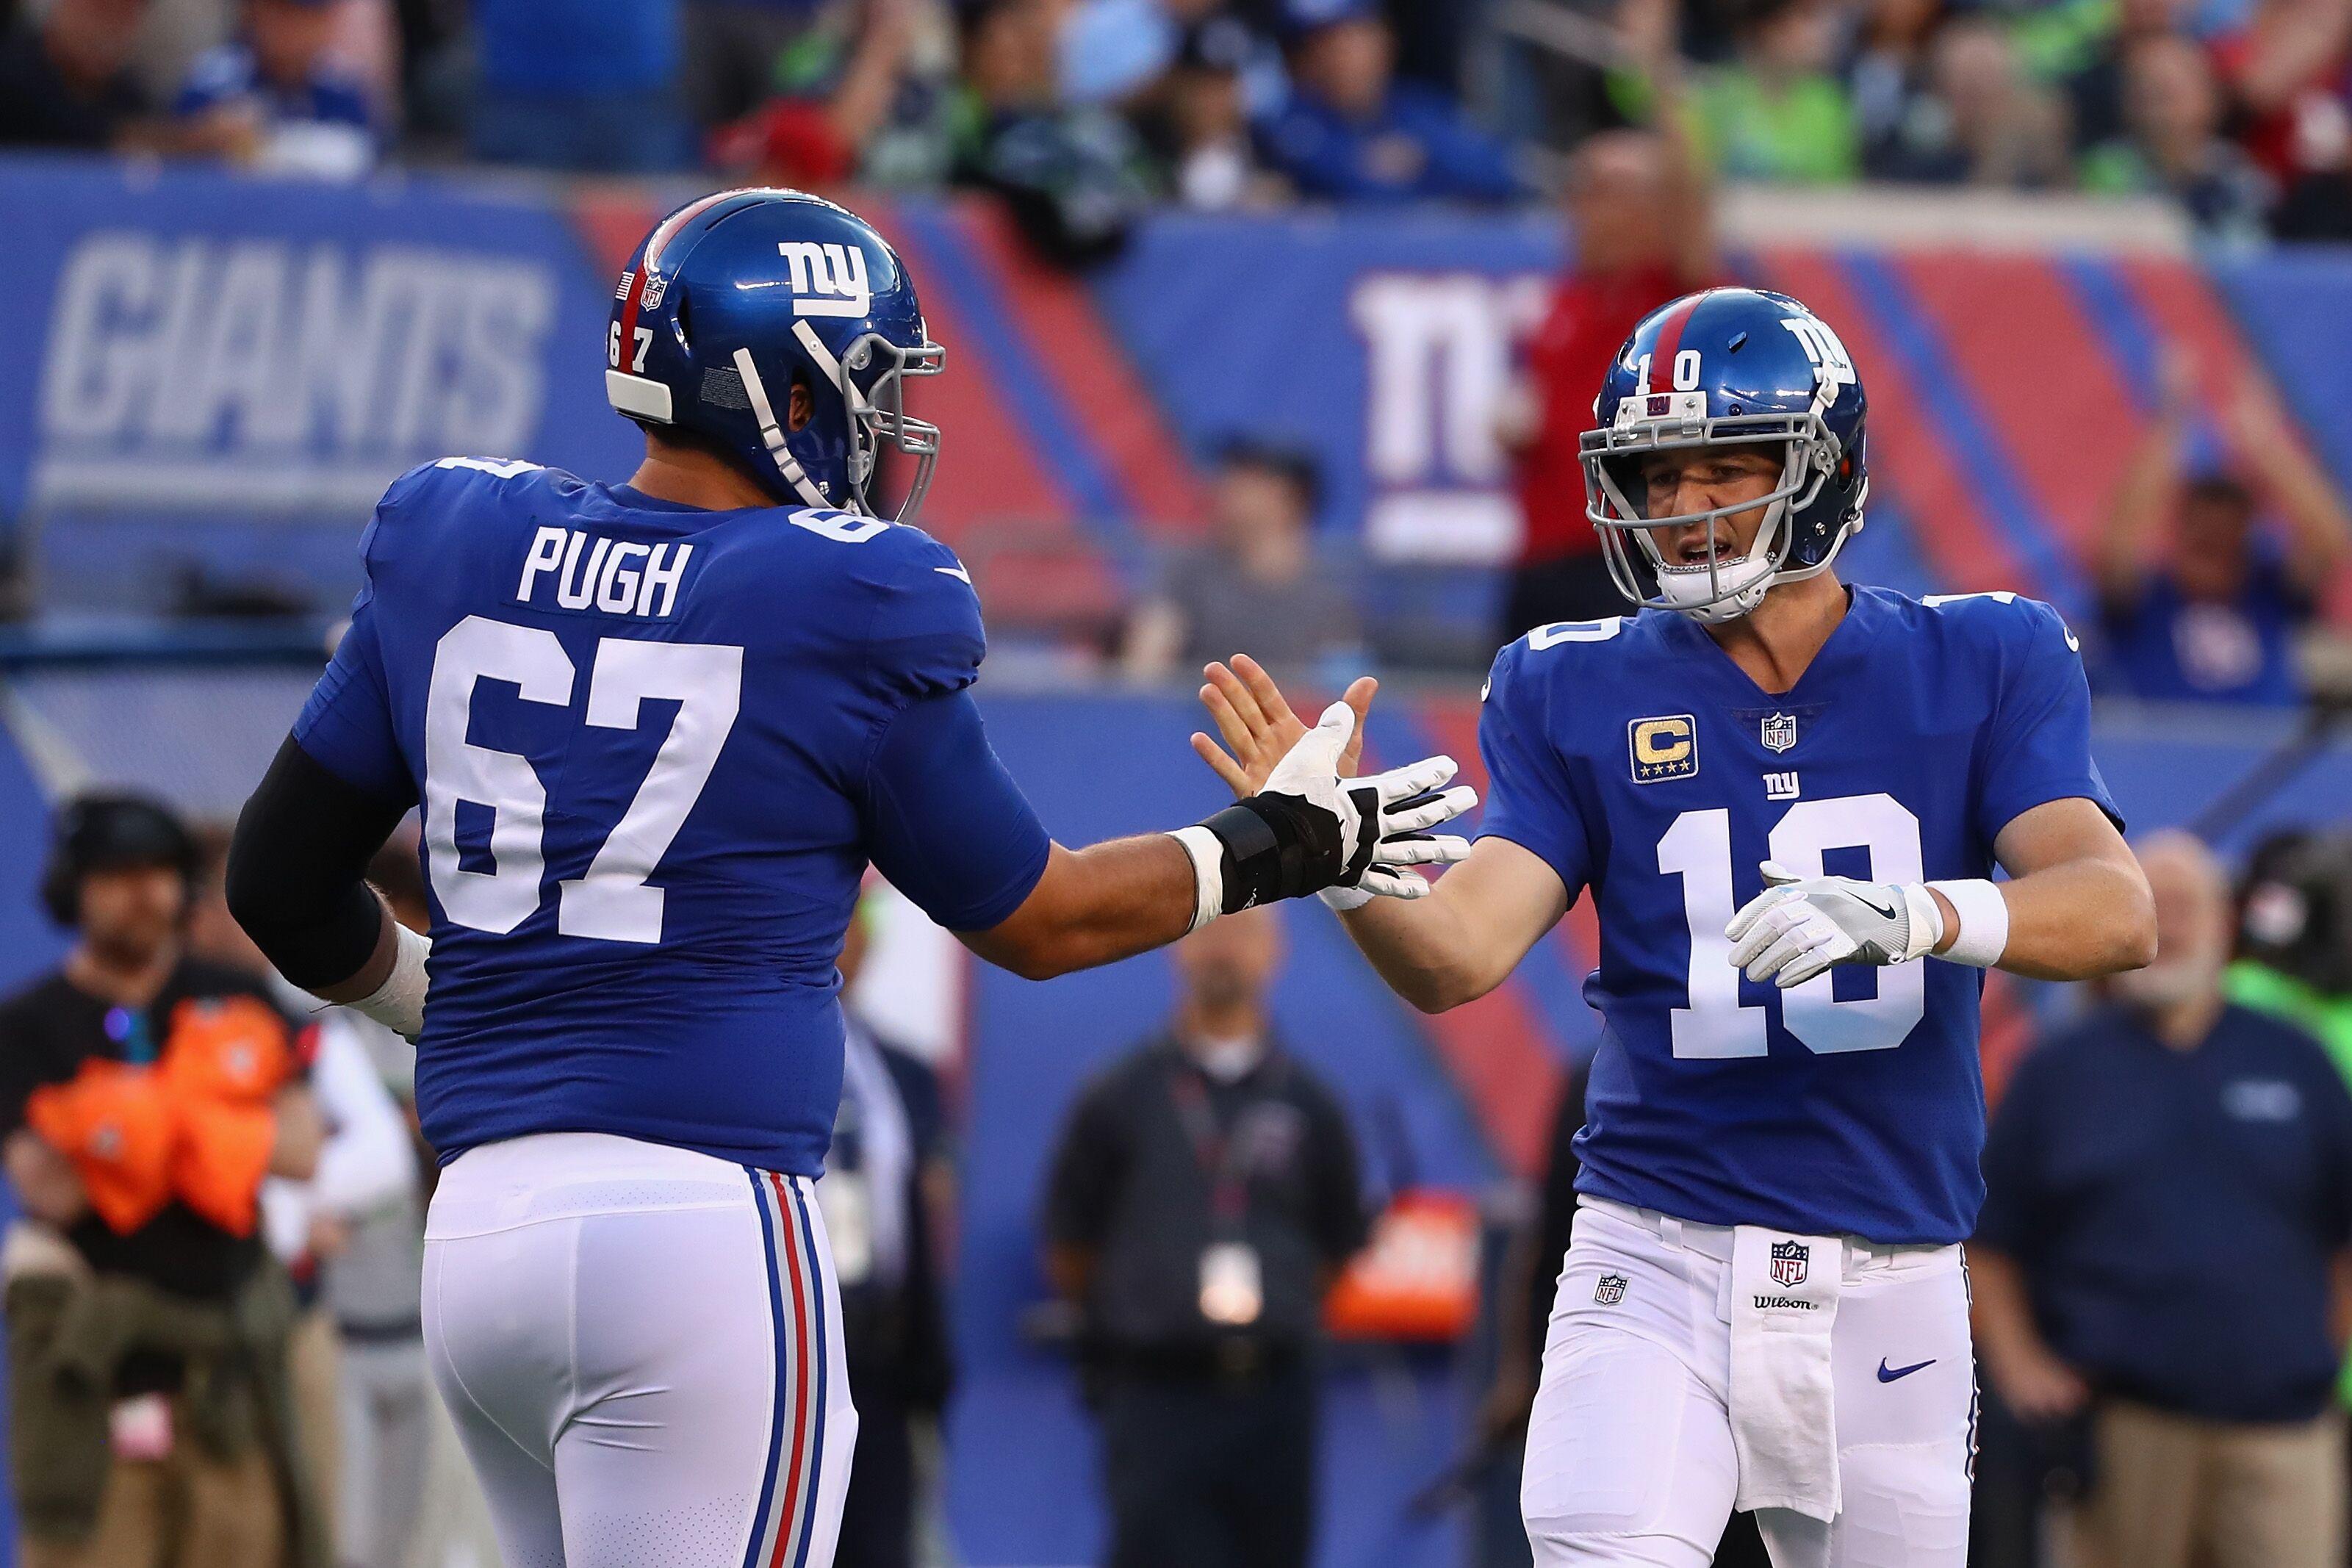 NFL Draft 2018: New York Giants 7-round mock